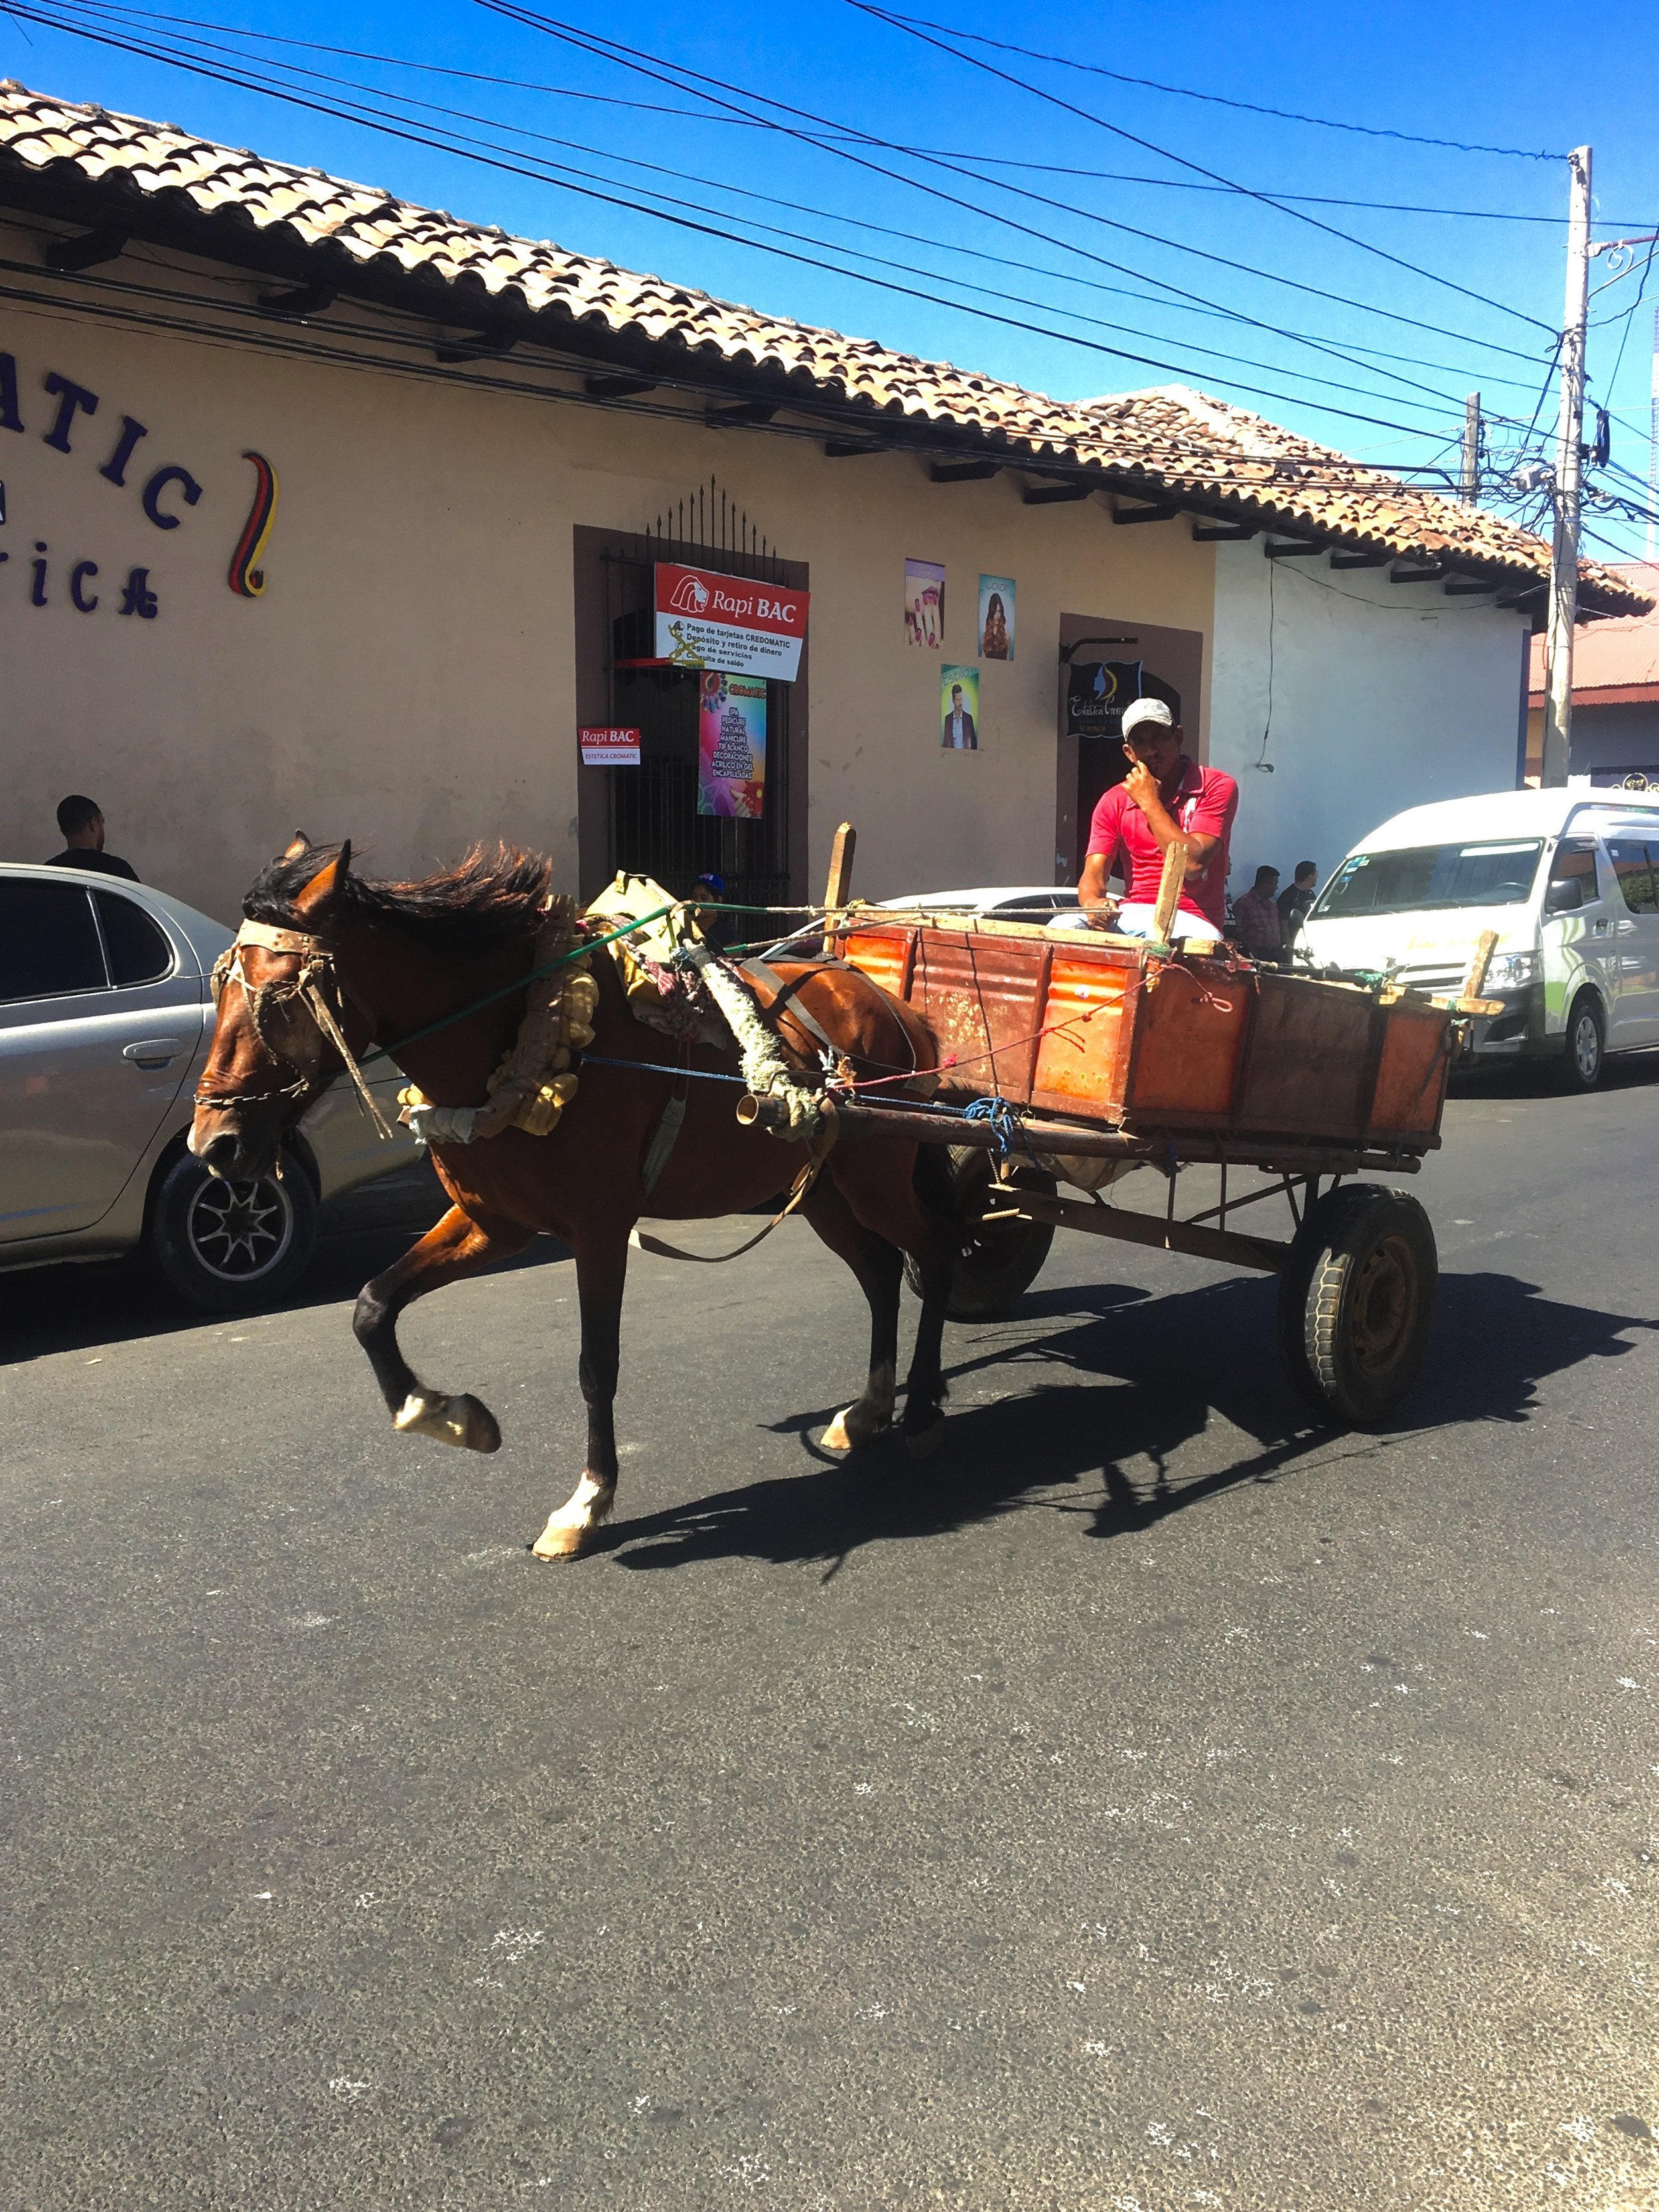 Horse buggy Photo by Ana.jpg